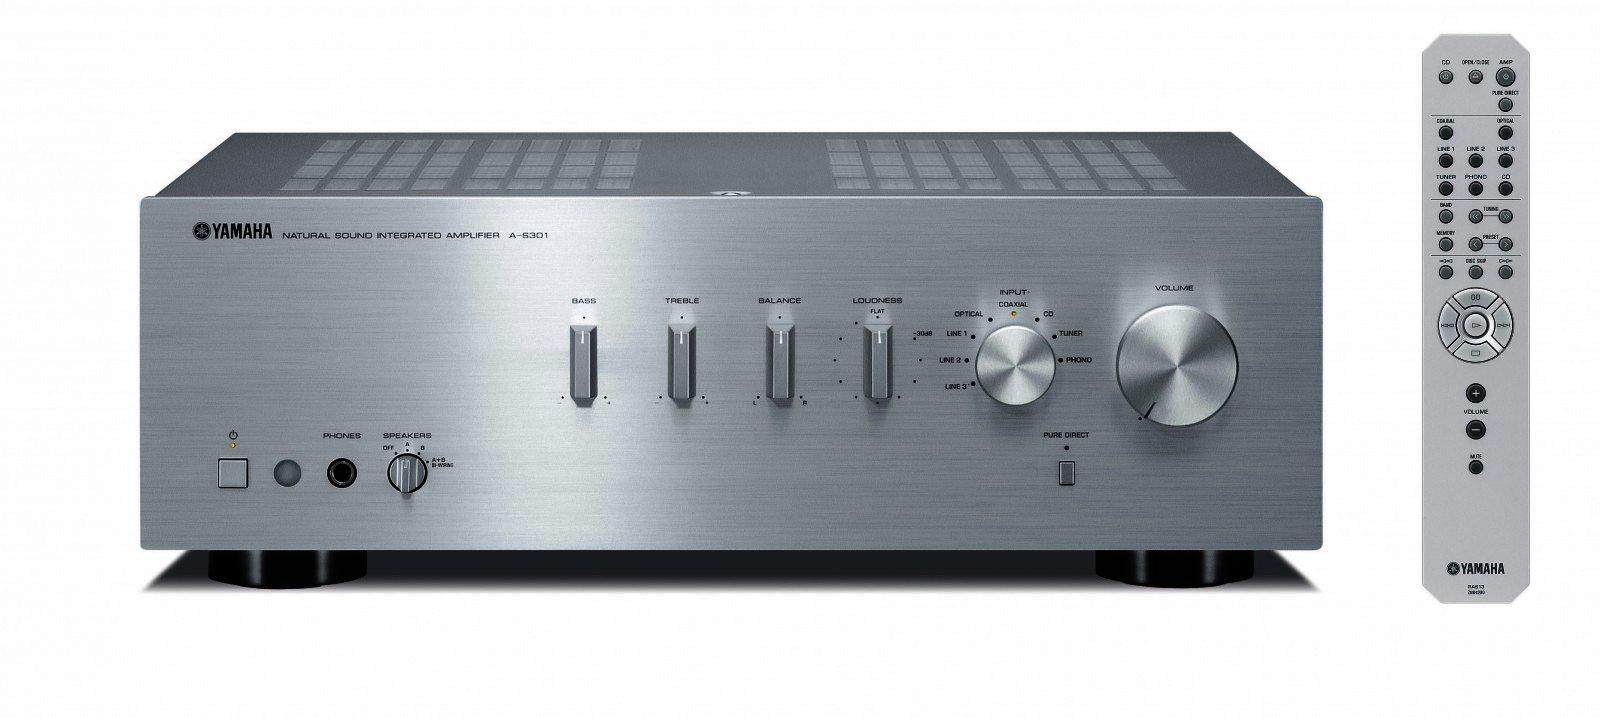 yamaha a s301 stereo verst rker vollverst rker hifi. Black Bedroom Furniture Sets. Home Design Ideas